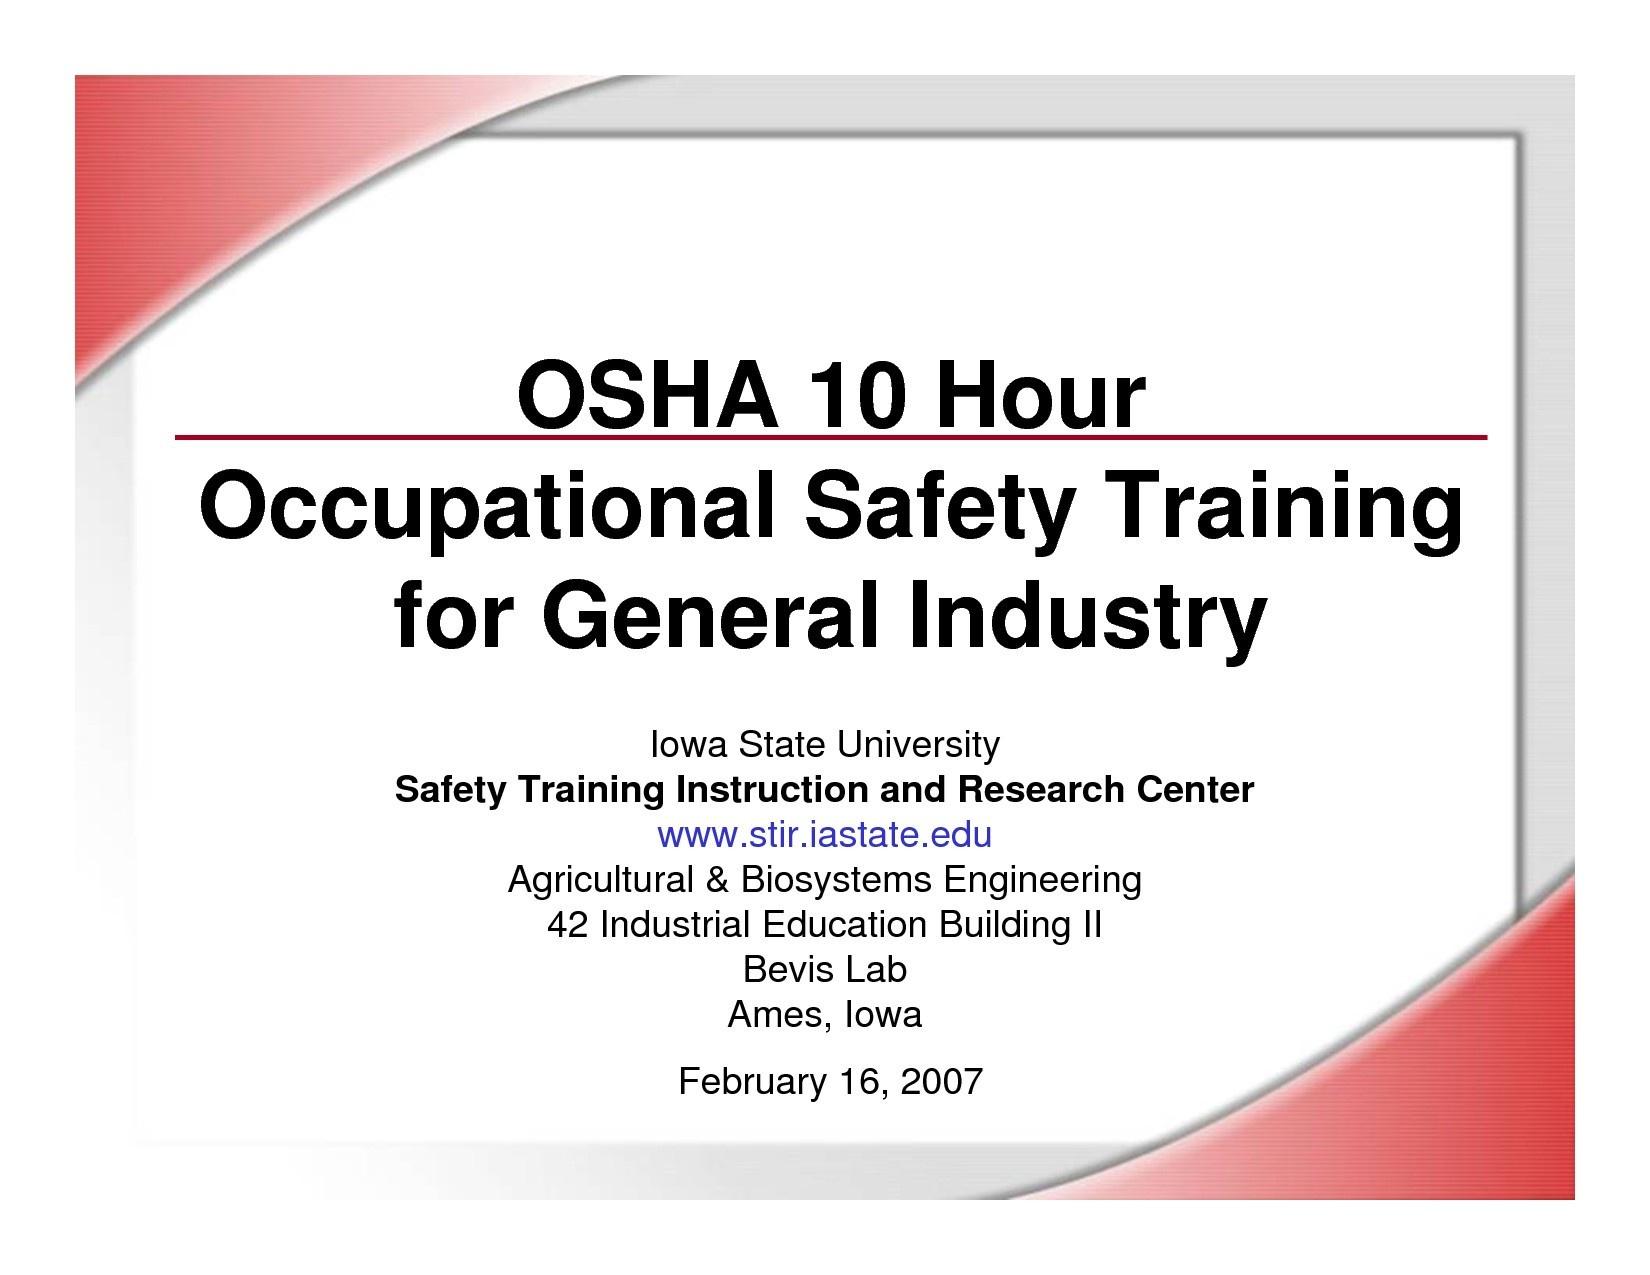 Osha Train The Trainer Forklift Certification | Urbancurlz - Free Printable Forklift Certification Cards